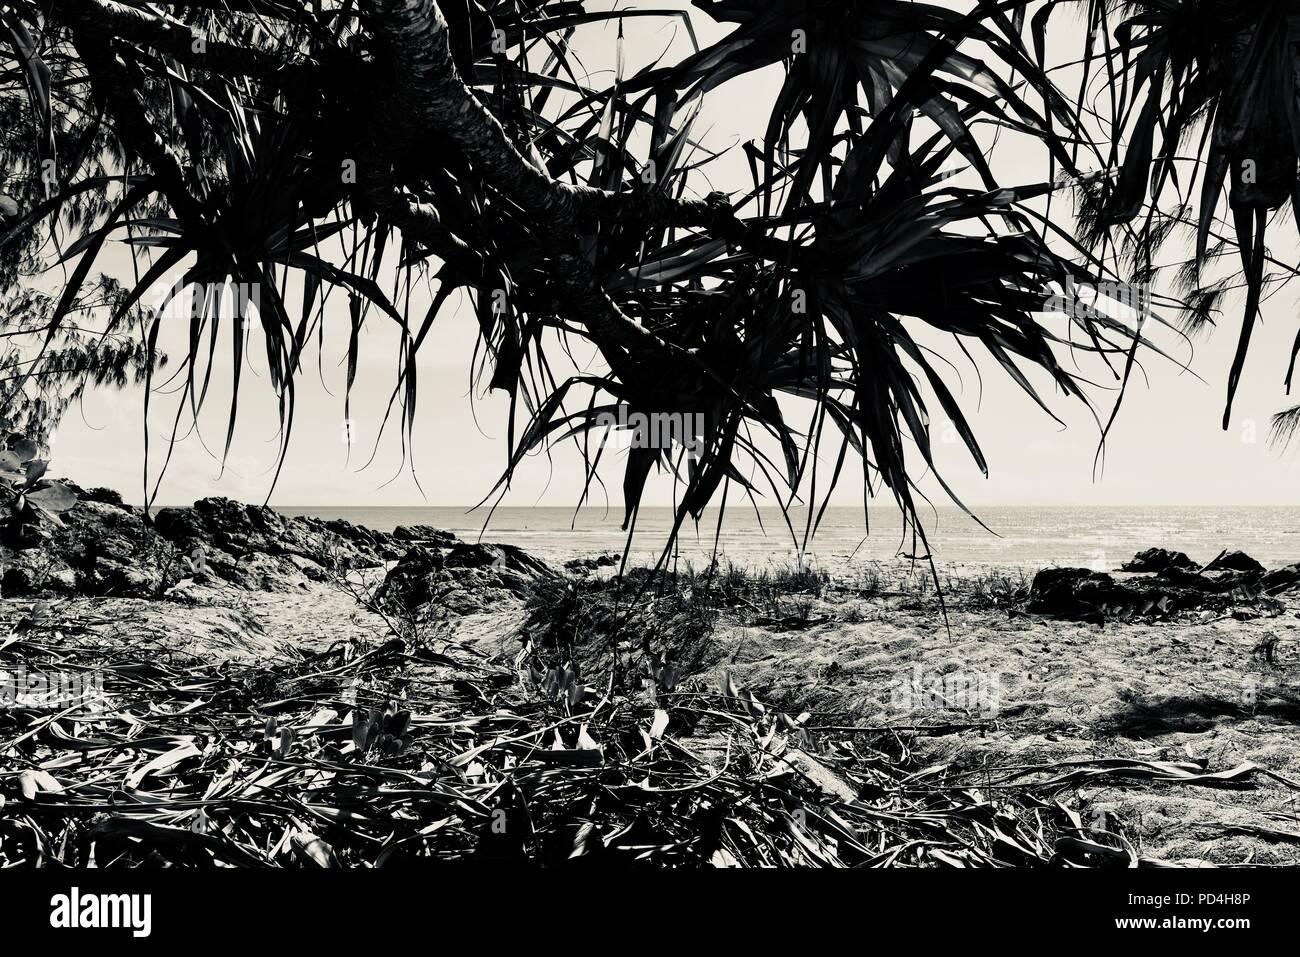 Pandanus leaves overhanging a tropical beach, Toomulla QLD, Australia - Stock Image